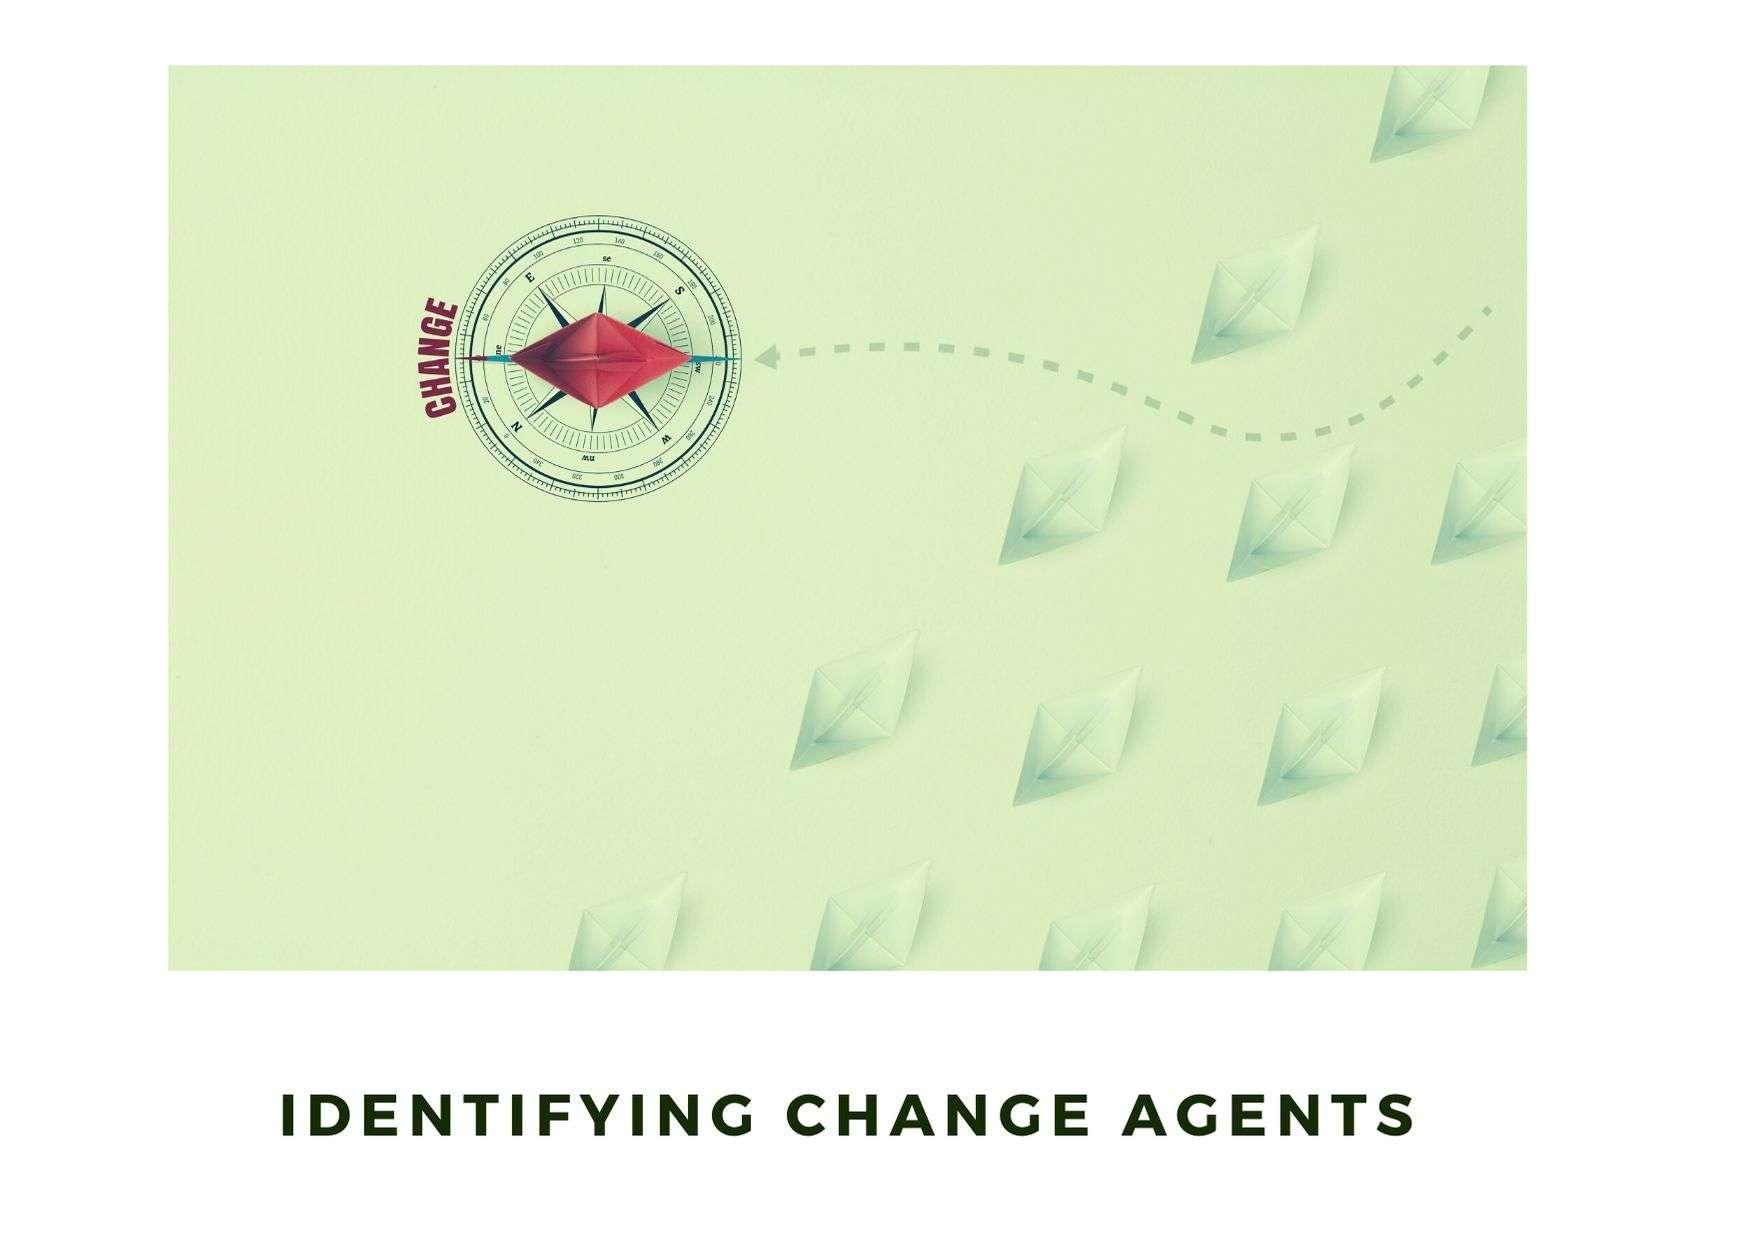 Identifying Change Agents